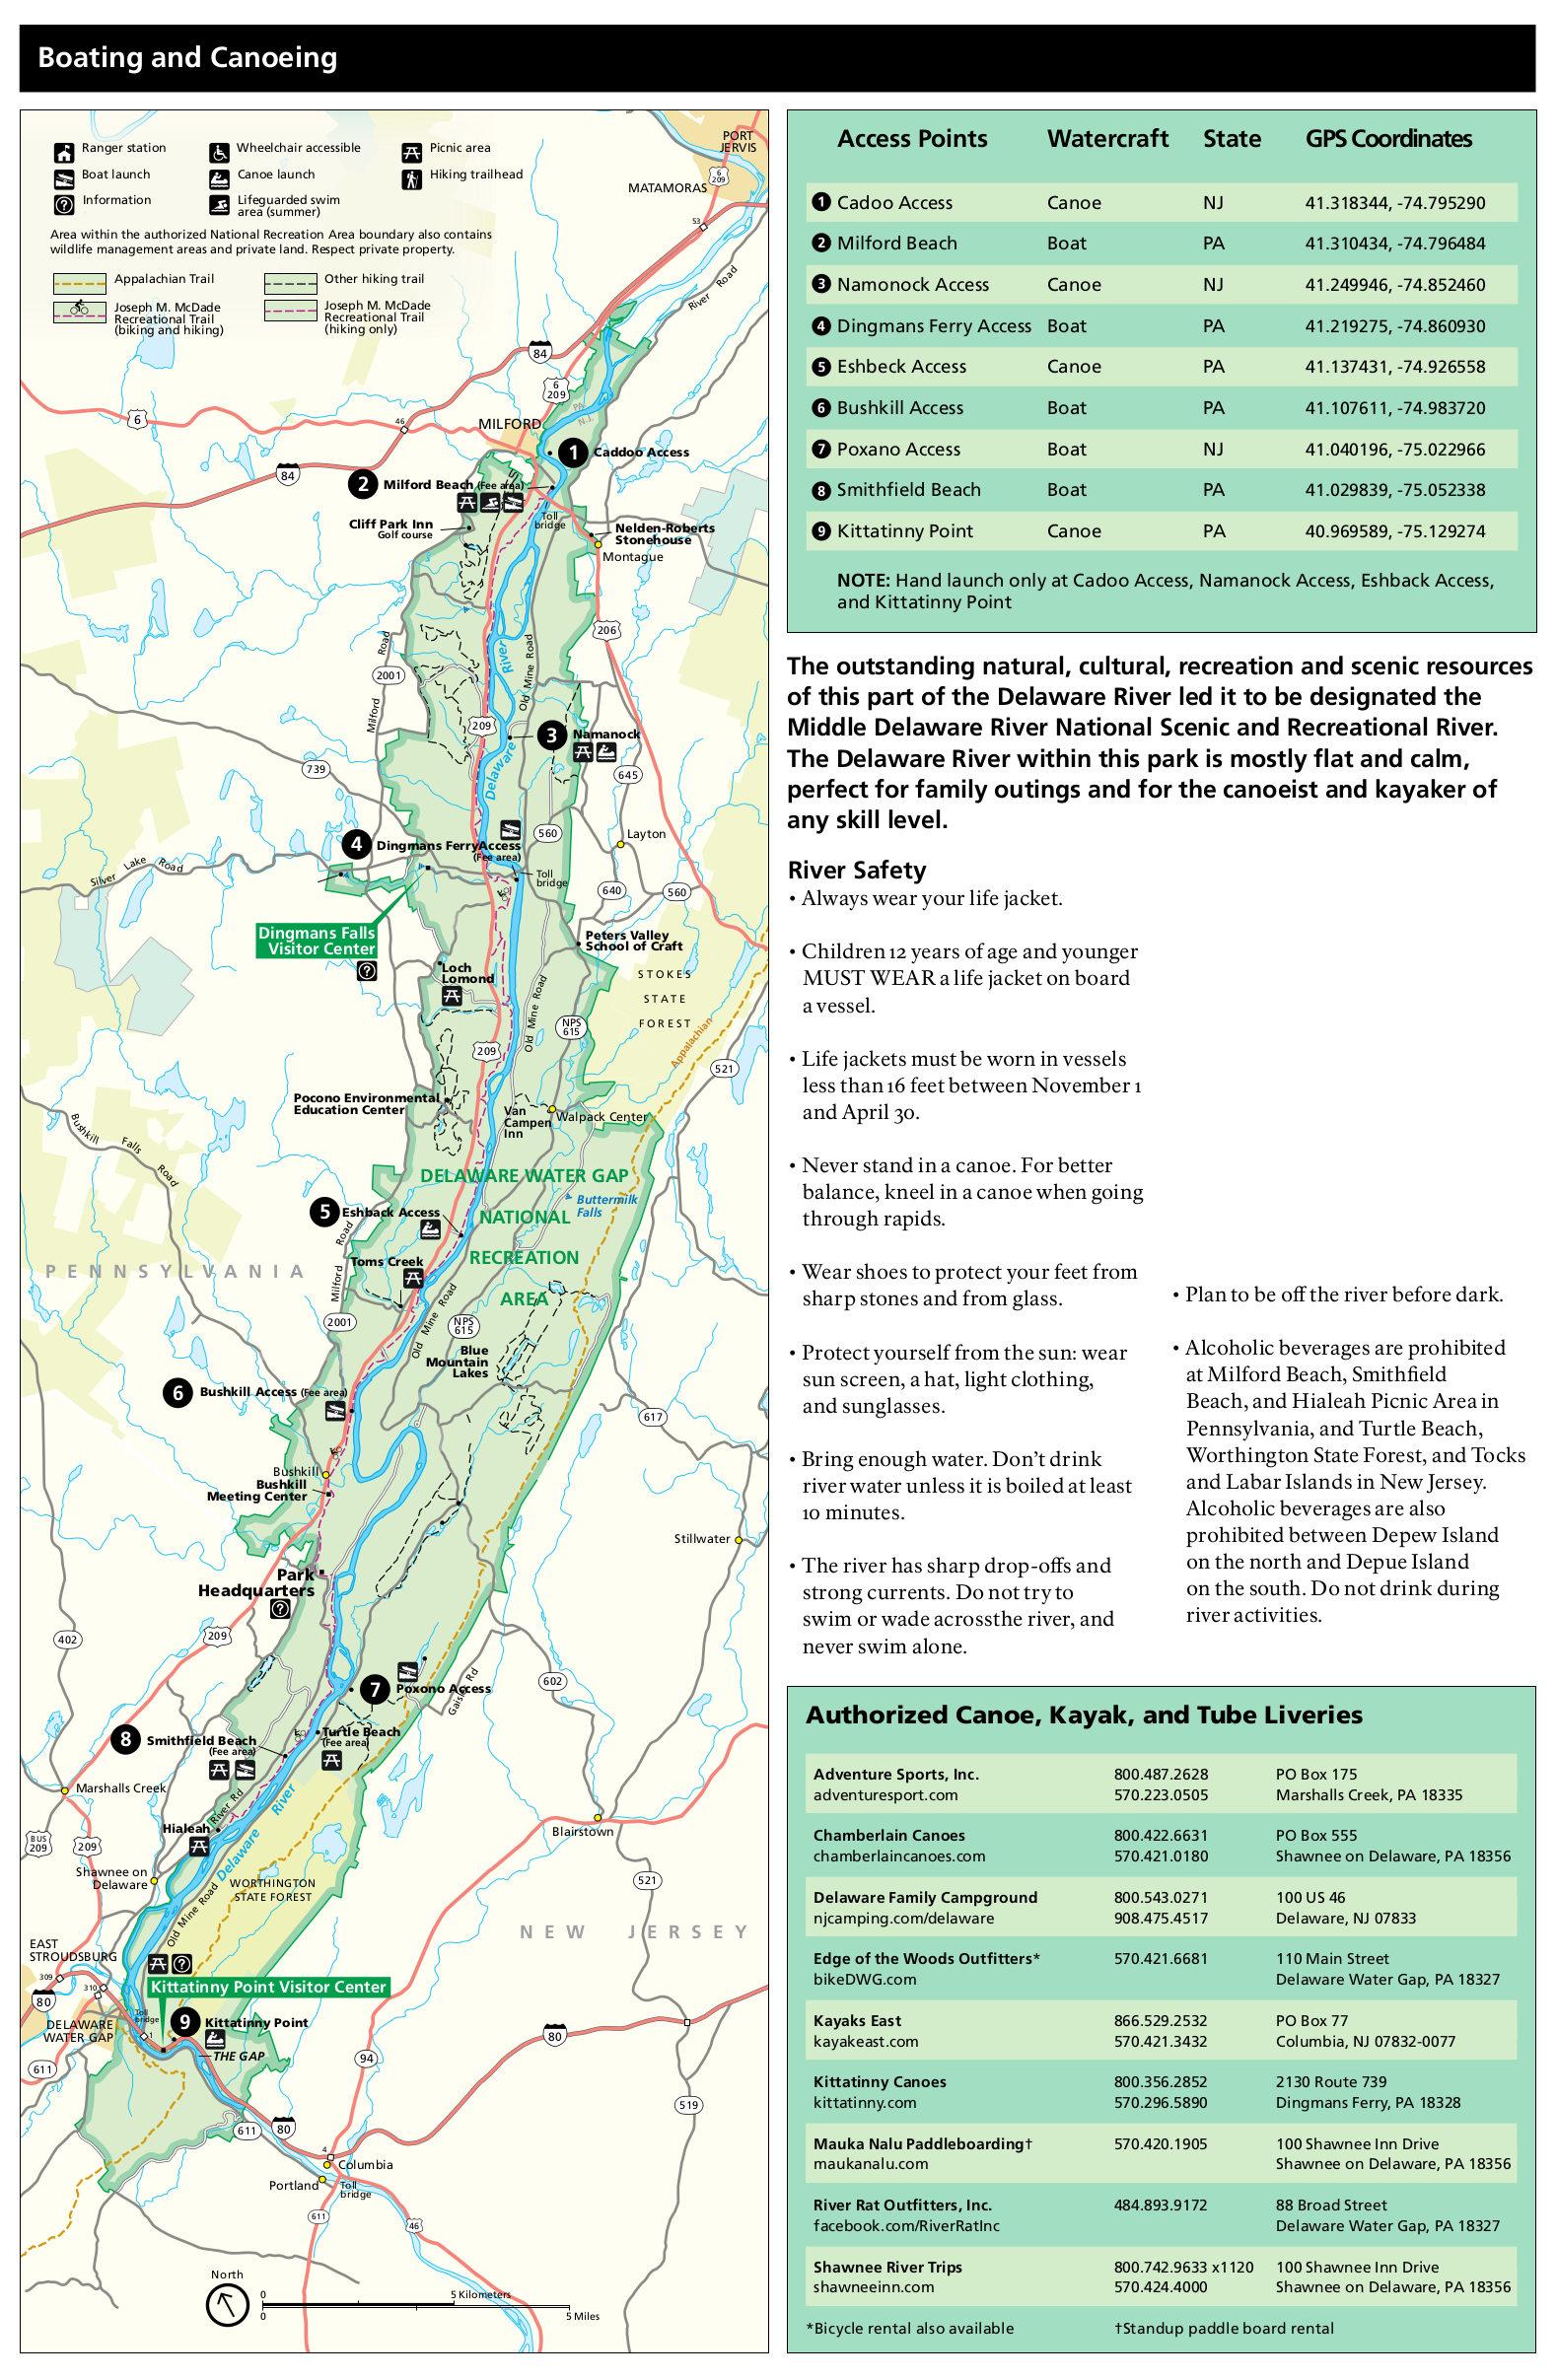 map delaware water gap File Nps Delaware Water Gap Boating Map Jpg Wikimedia Commons map delaware water gap